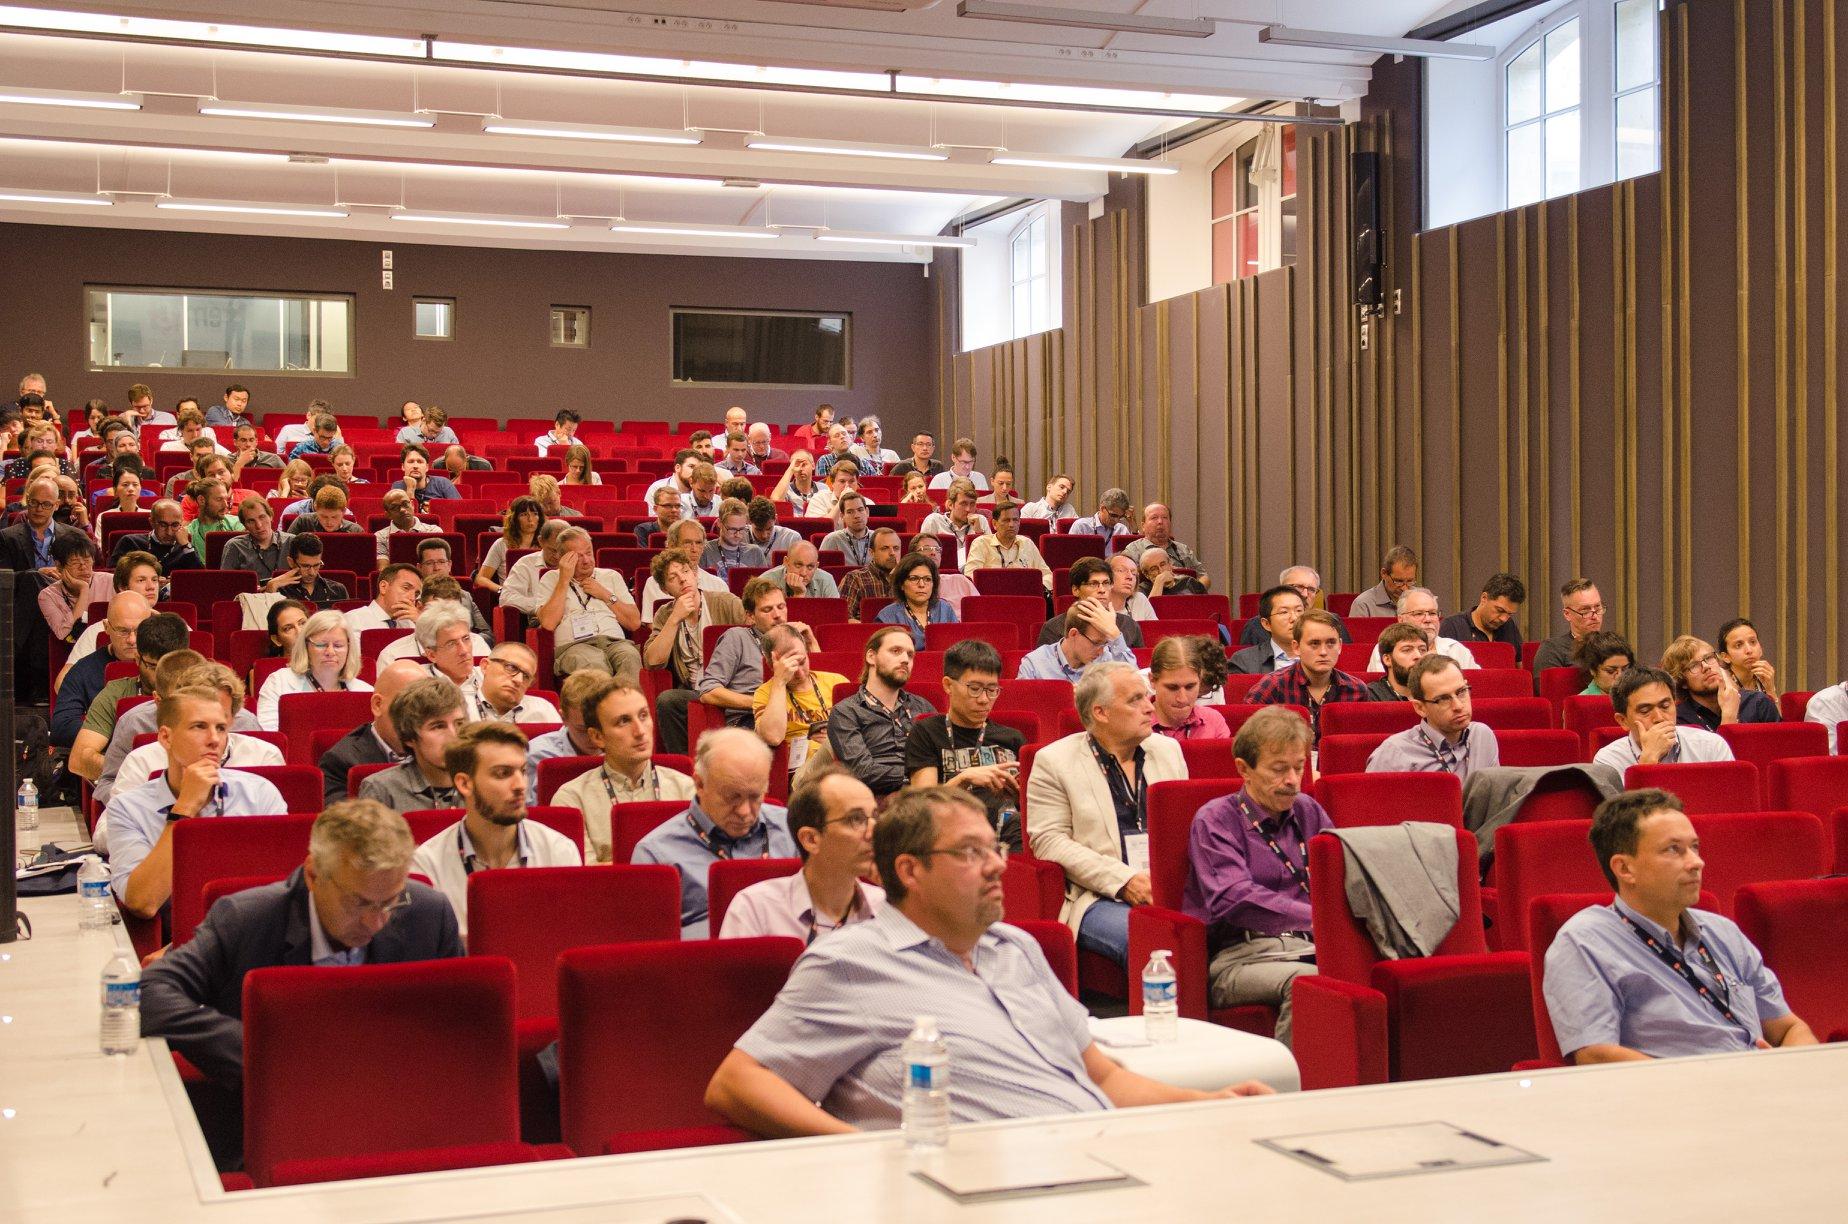 Auditorium - QTech 2018